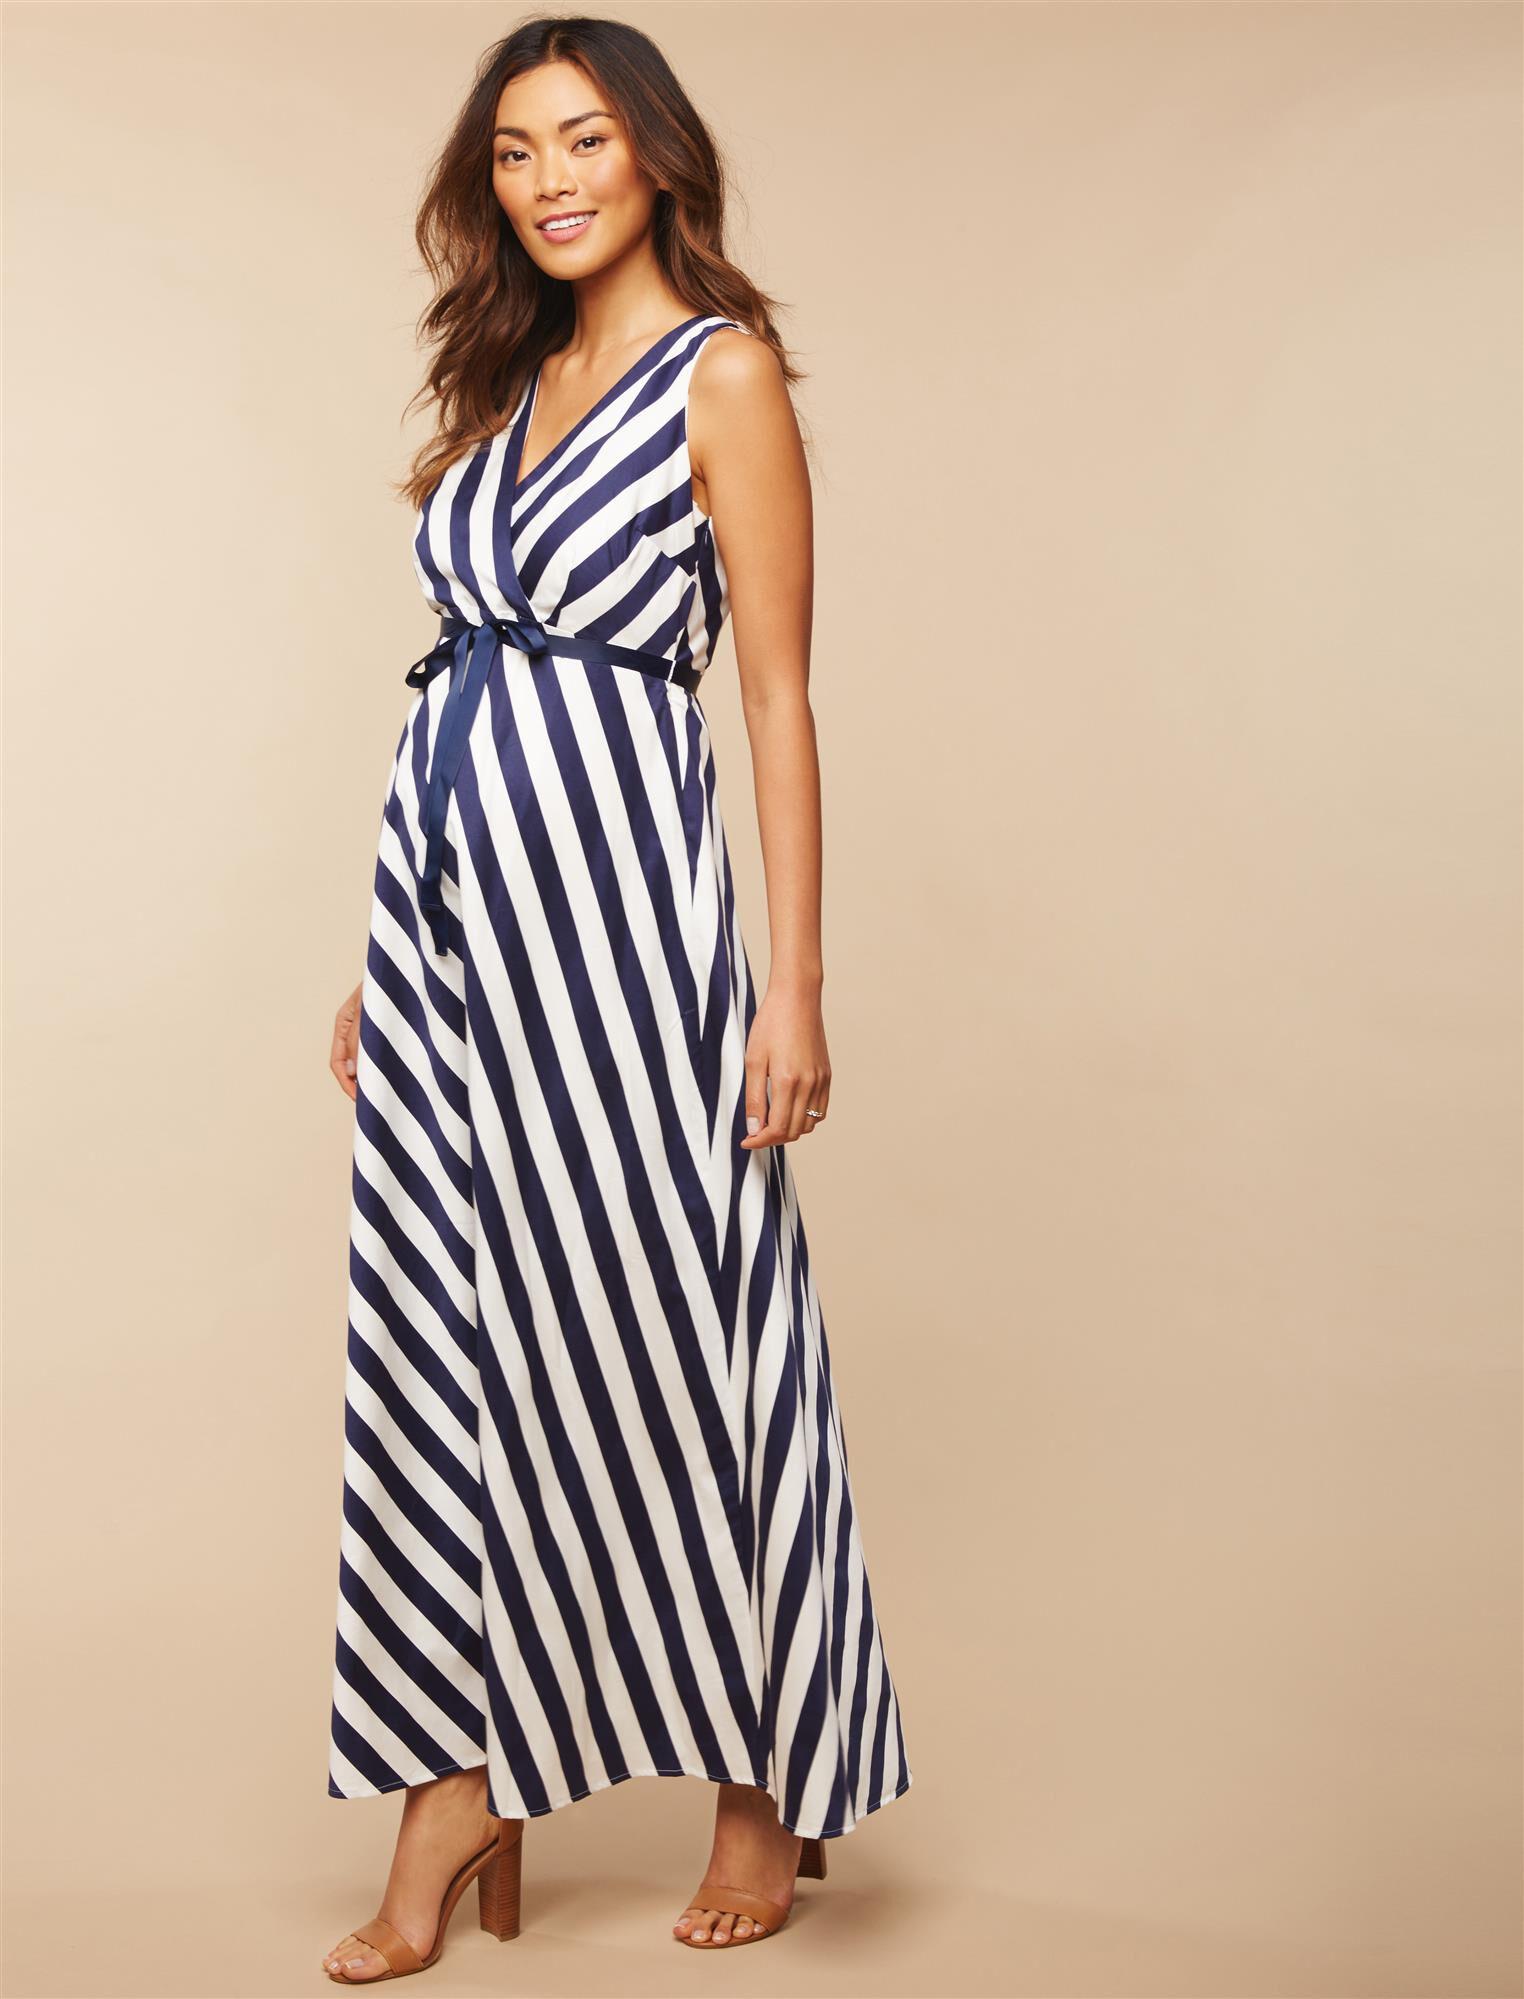 Jessica Simpson Sash Belt Maternity Dress